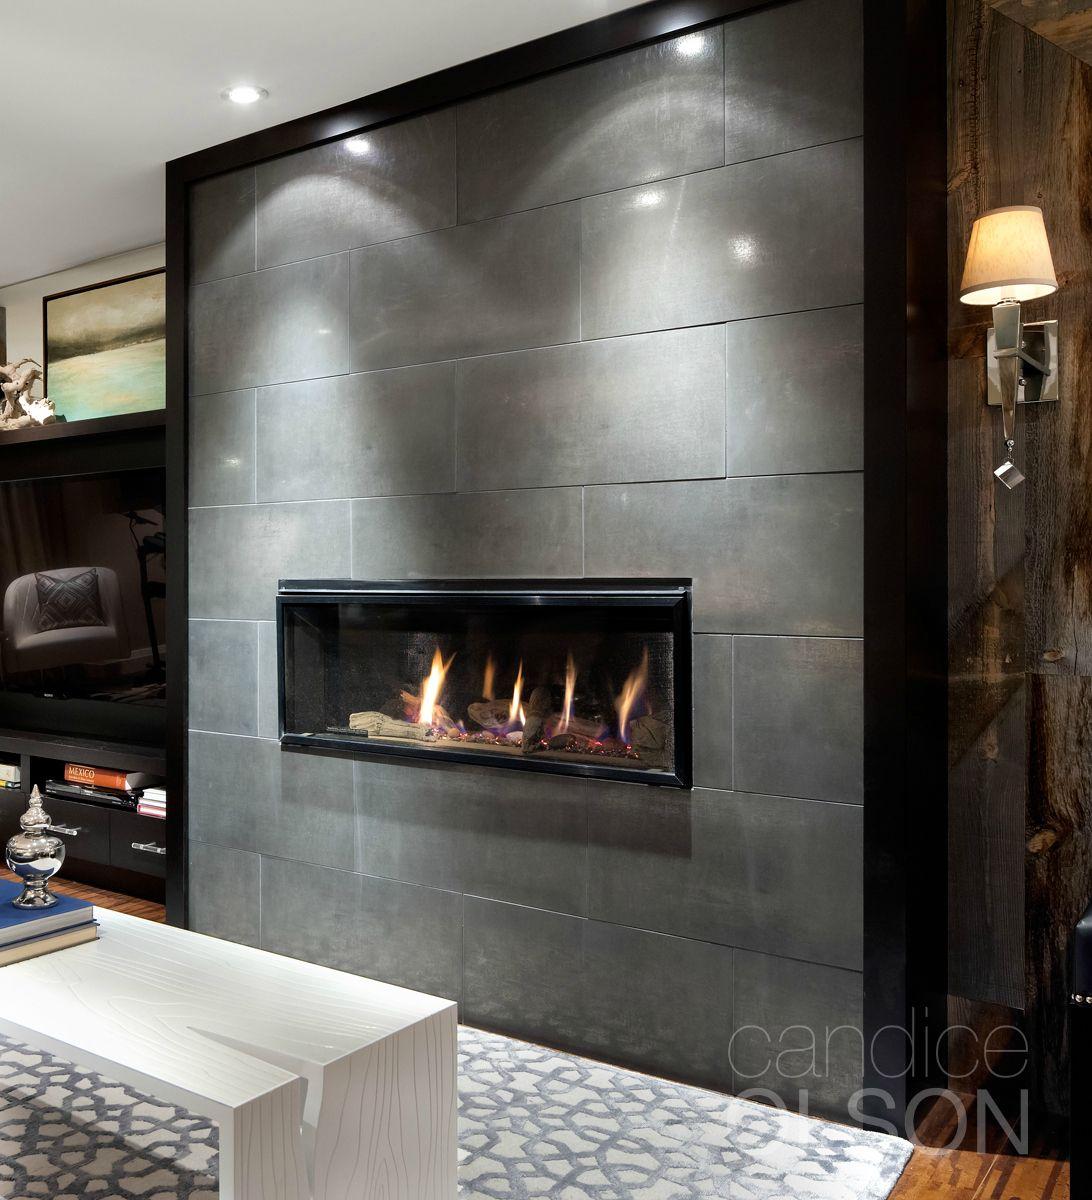 Candice Olson Basement Design: Fireplace Designed By Candice Olson Design Inc